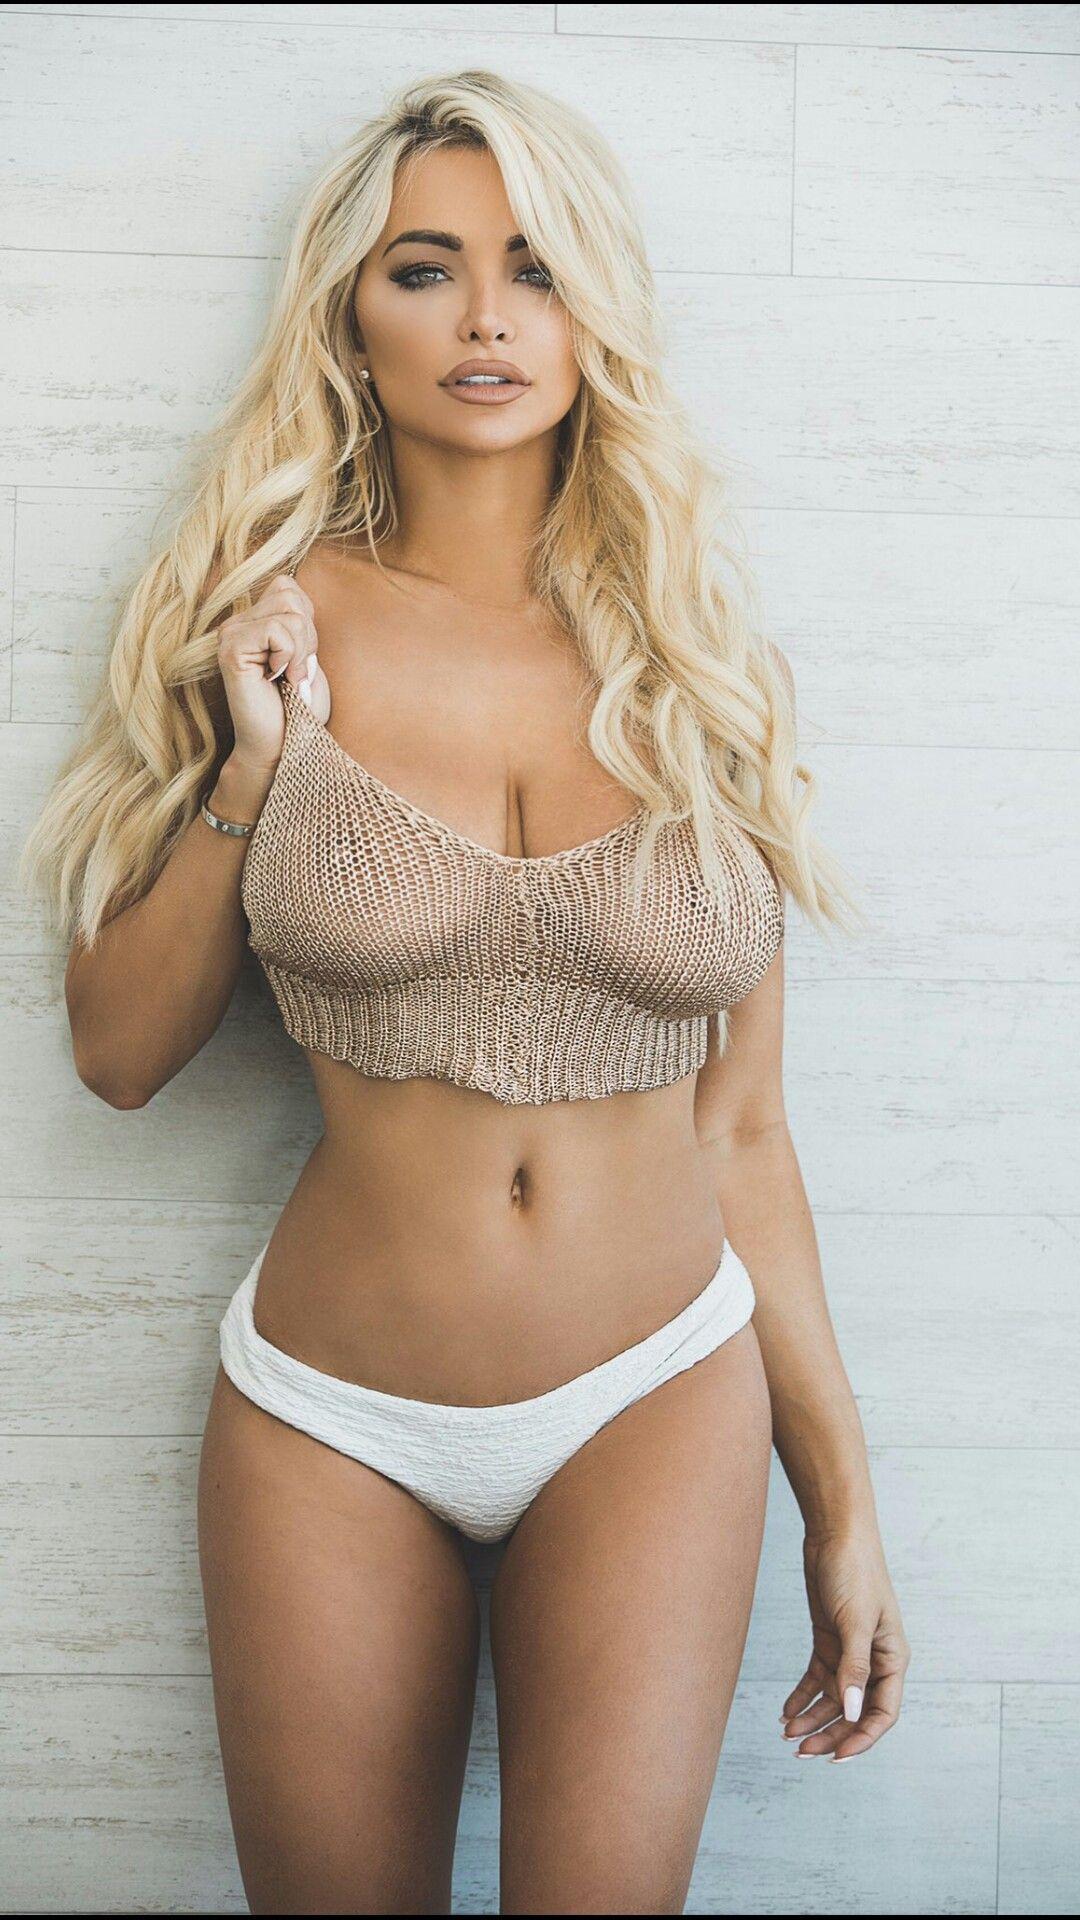 Cleavage Megan Hauserman nude (86 photos), Ass, Paparazzi, Instagram, butt 2020